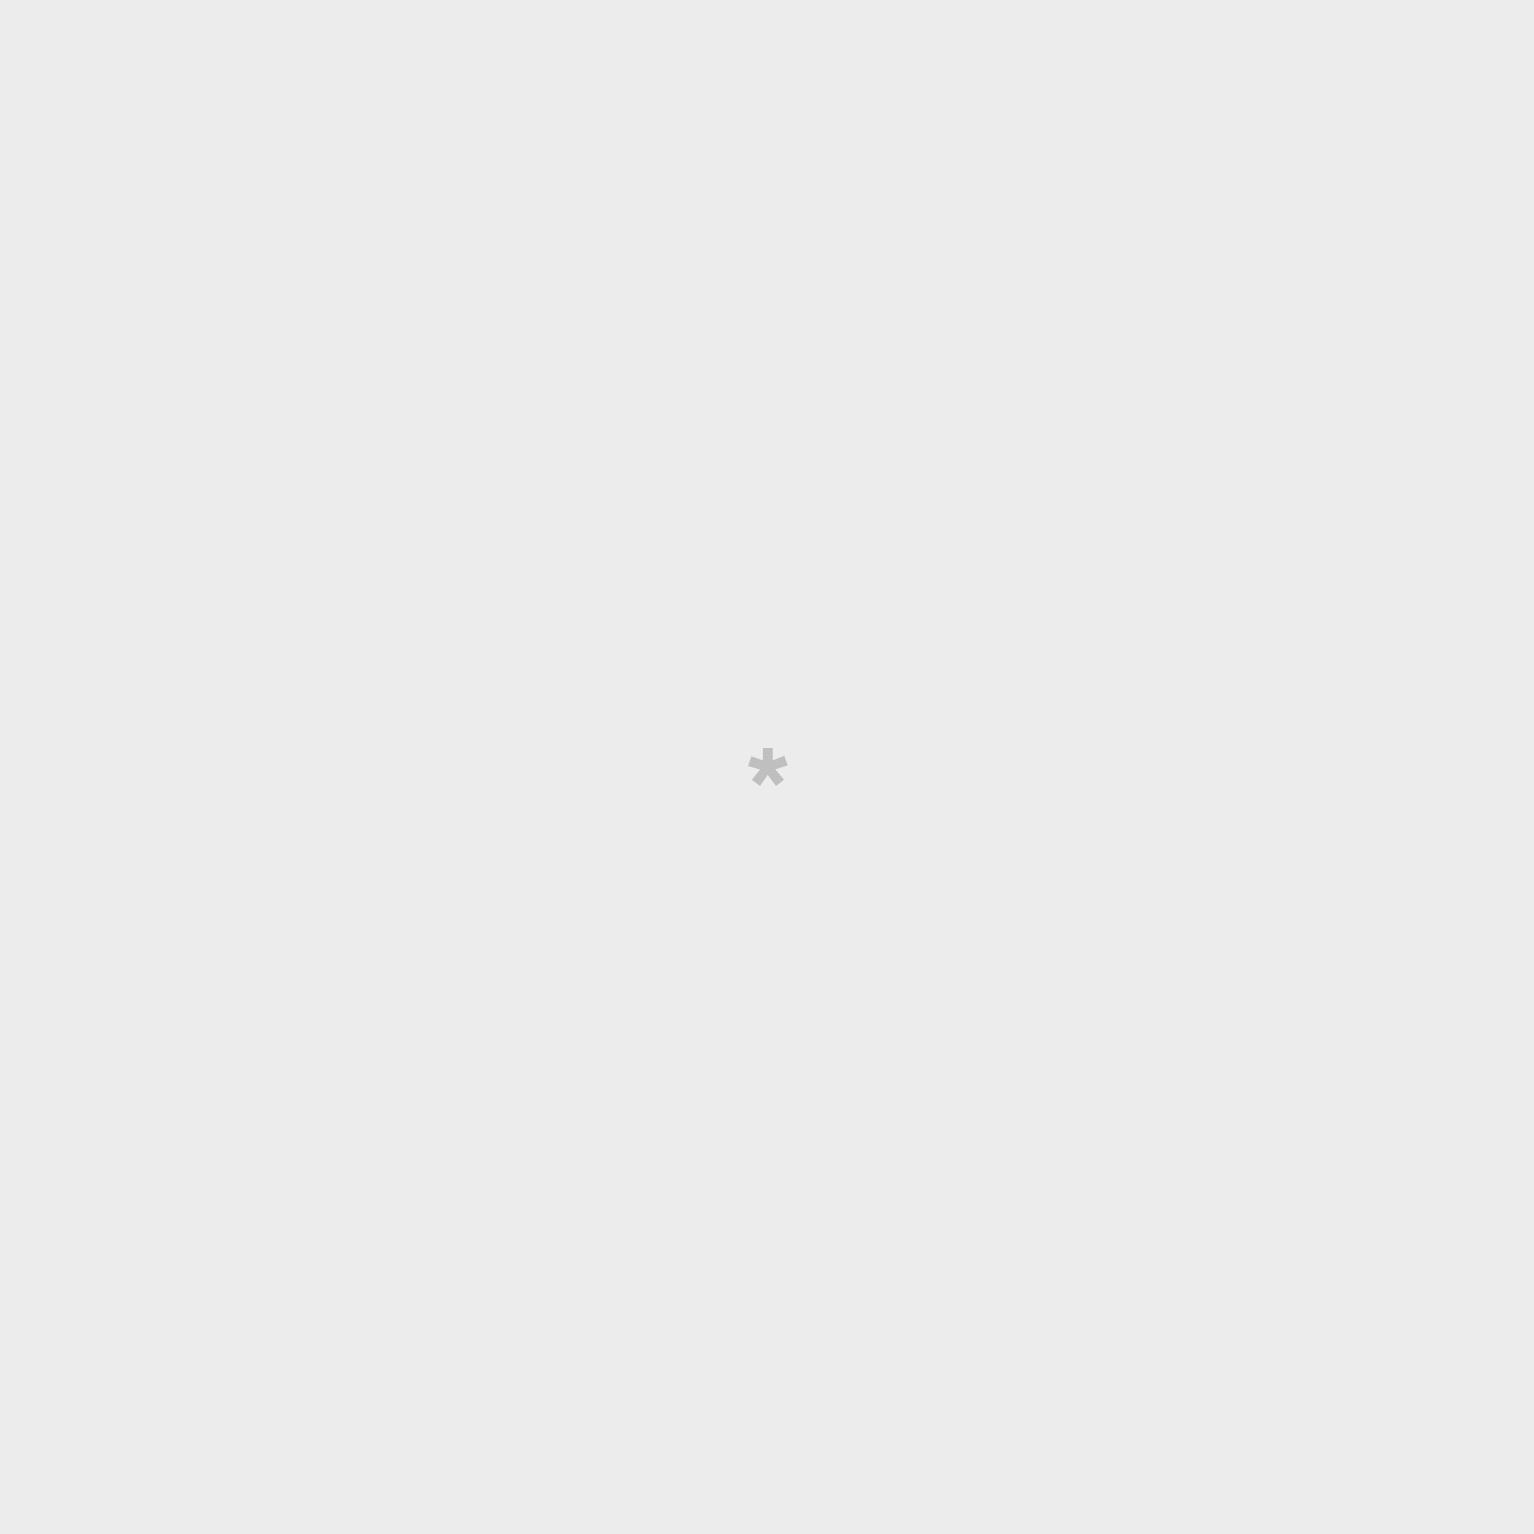 Set de agenda anual 2022 - 2022 va a ser alucinante